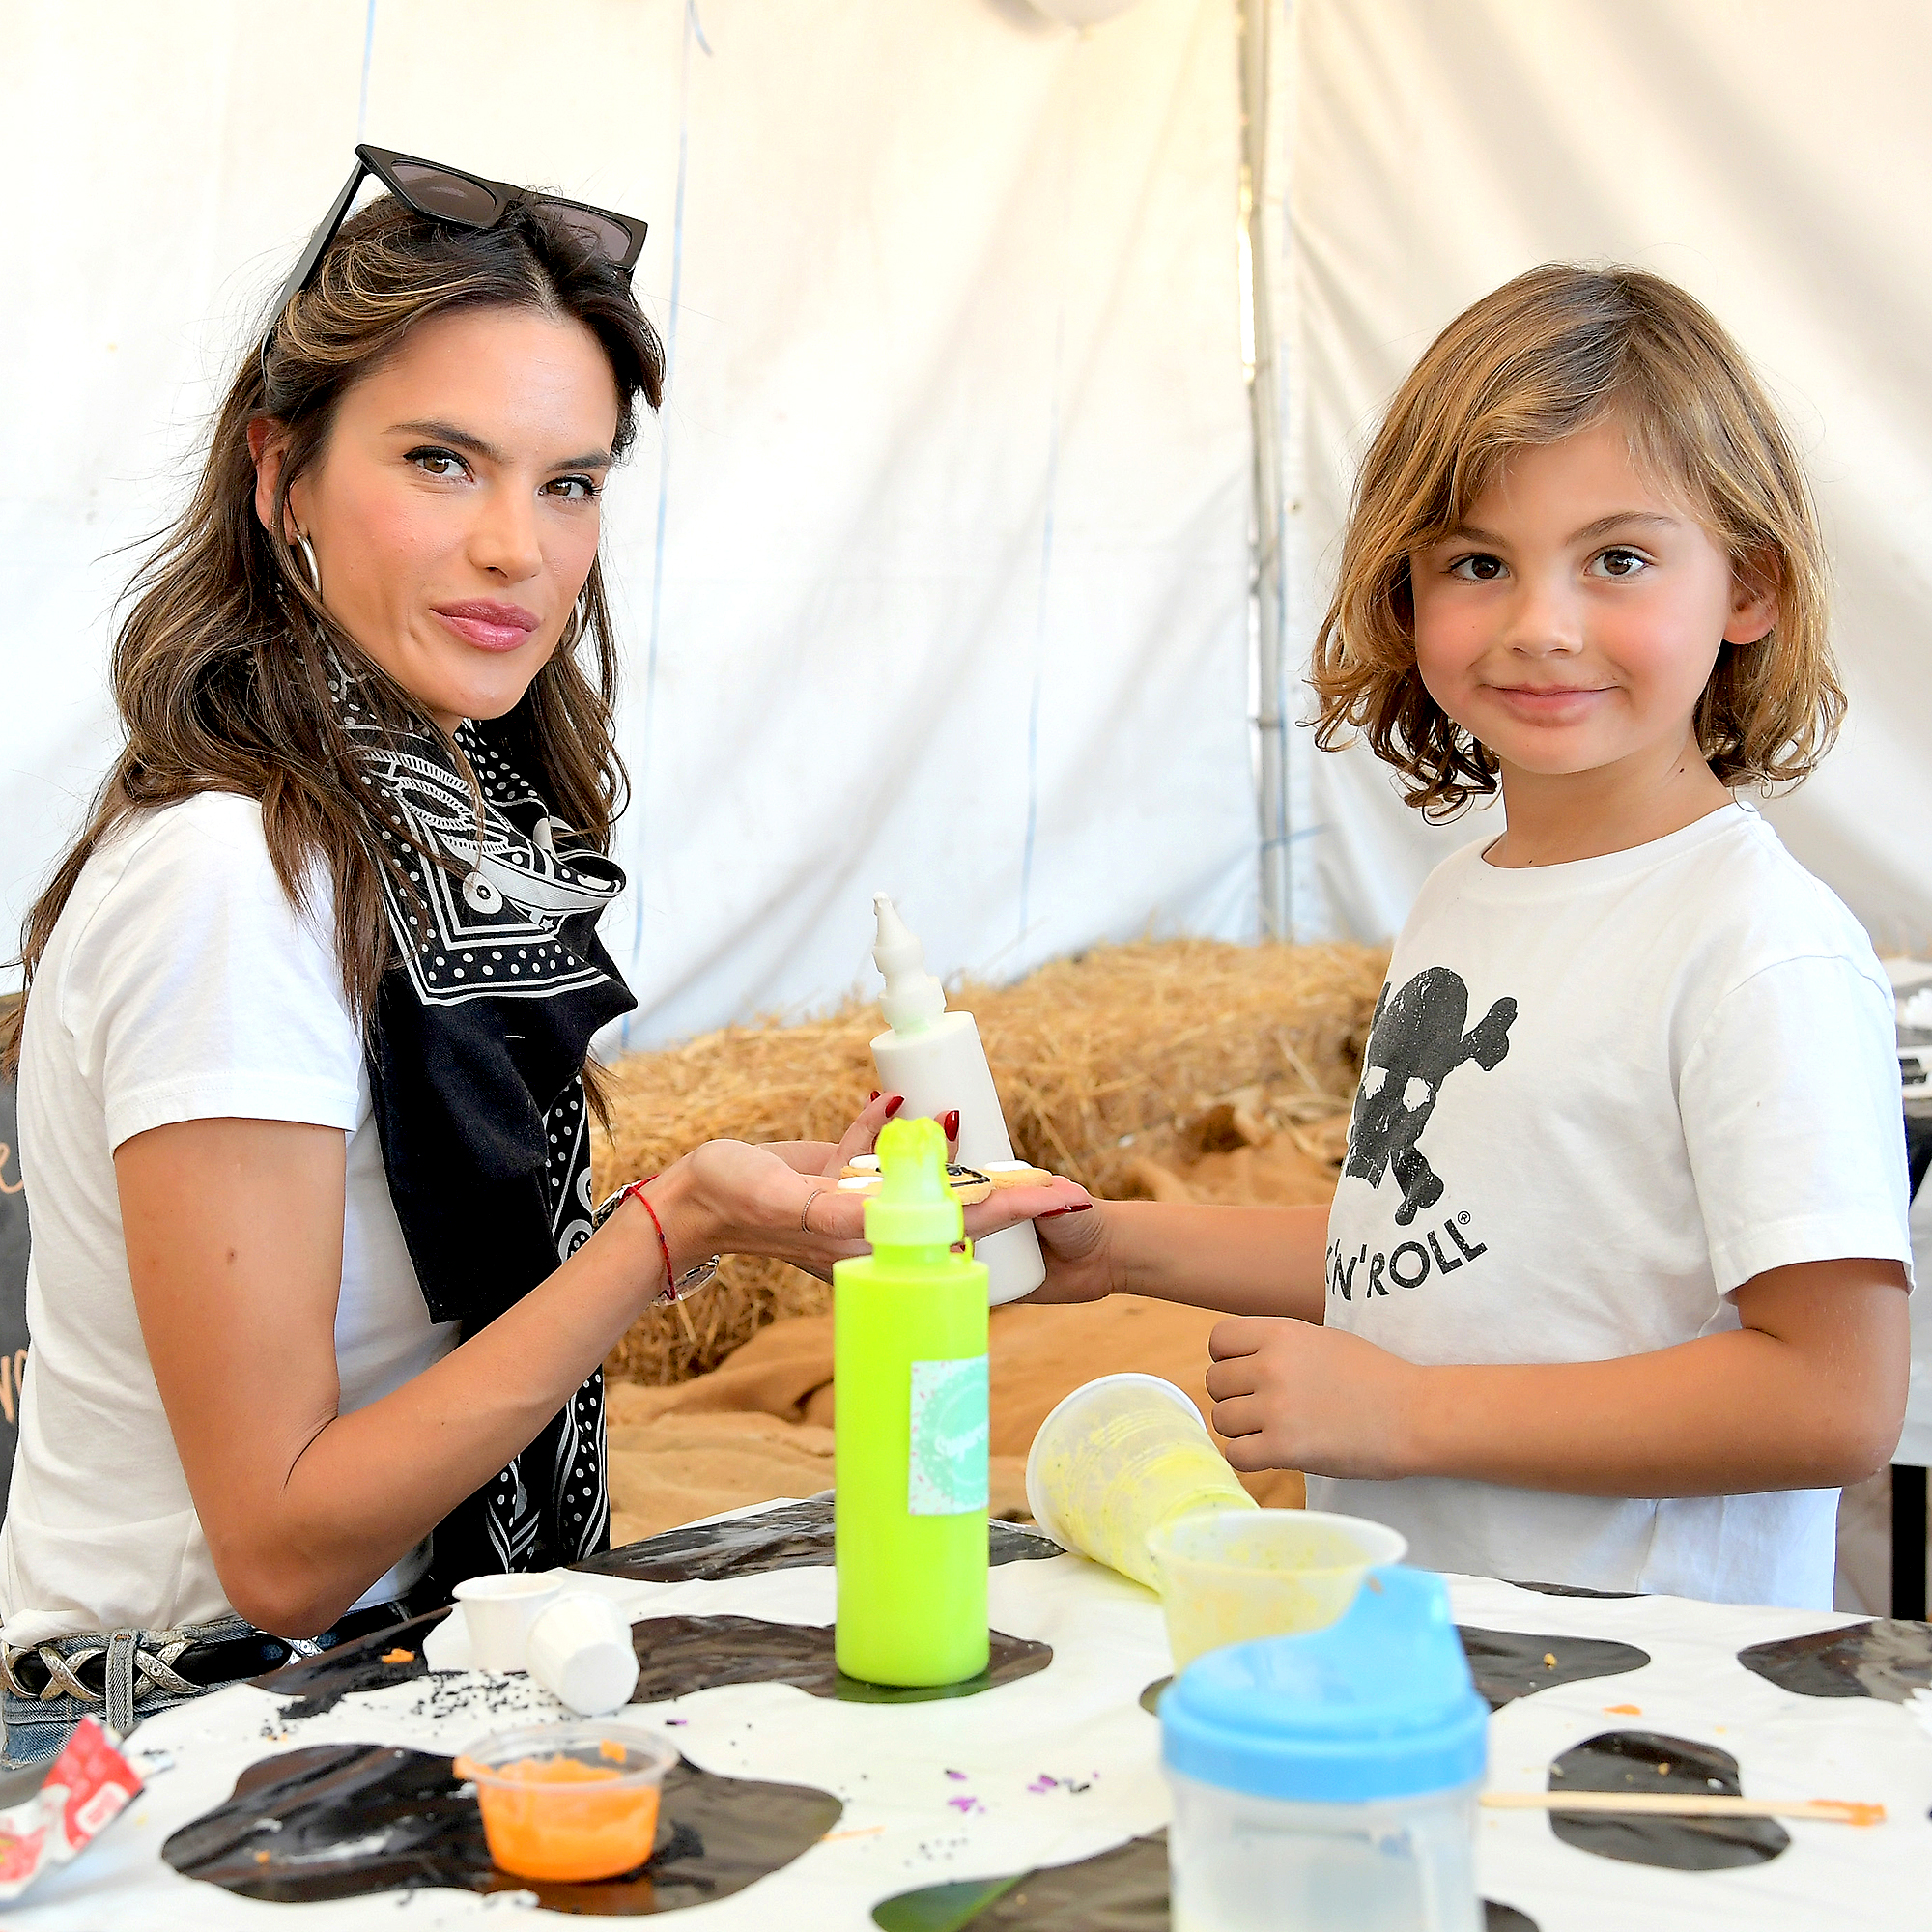 Noah-Phoenix-Ambrosio-Mazur-Alessandra-Ambrosio - Alessandra Ambrosio gave her son the middle name Phoenix when she and her ex-fiancé, Jamie Mazur , welcomed him in 2012.